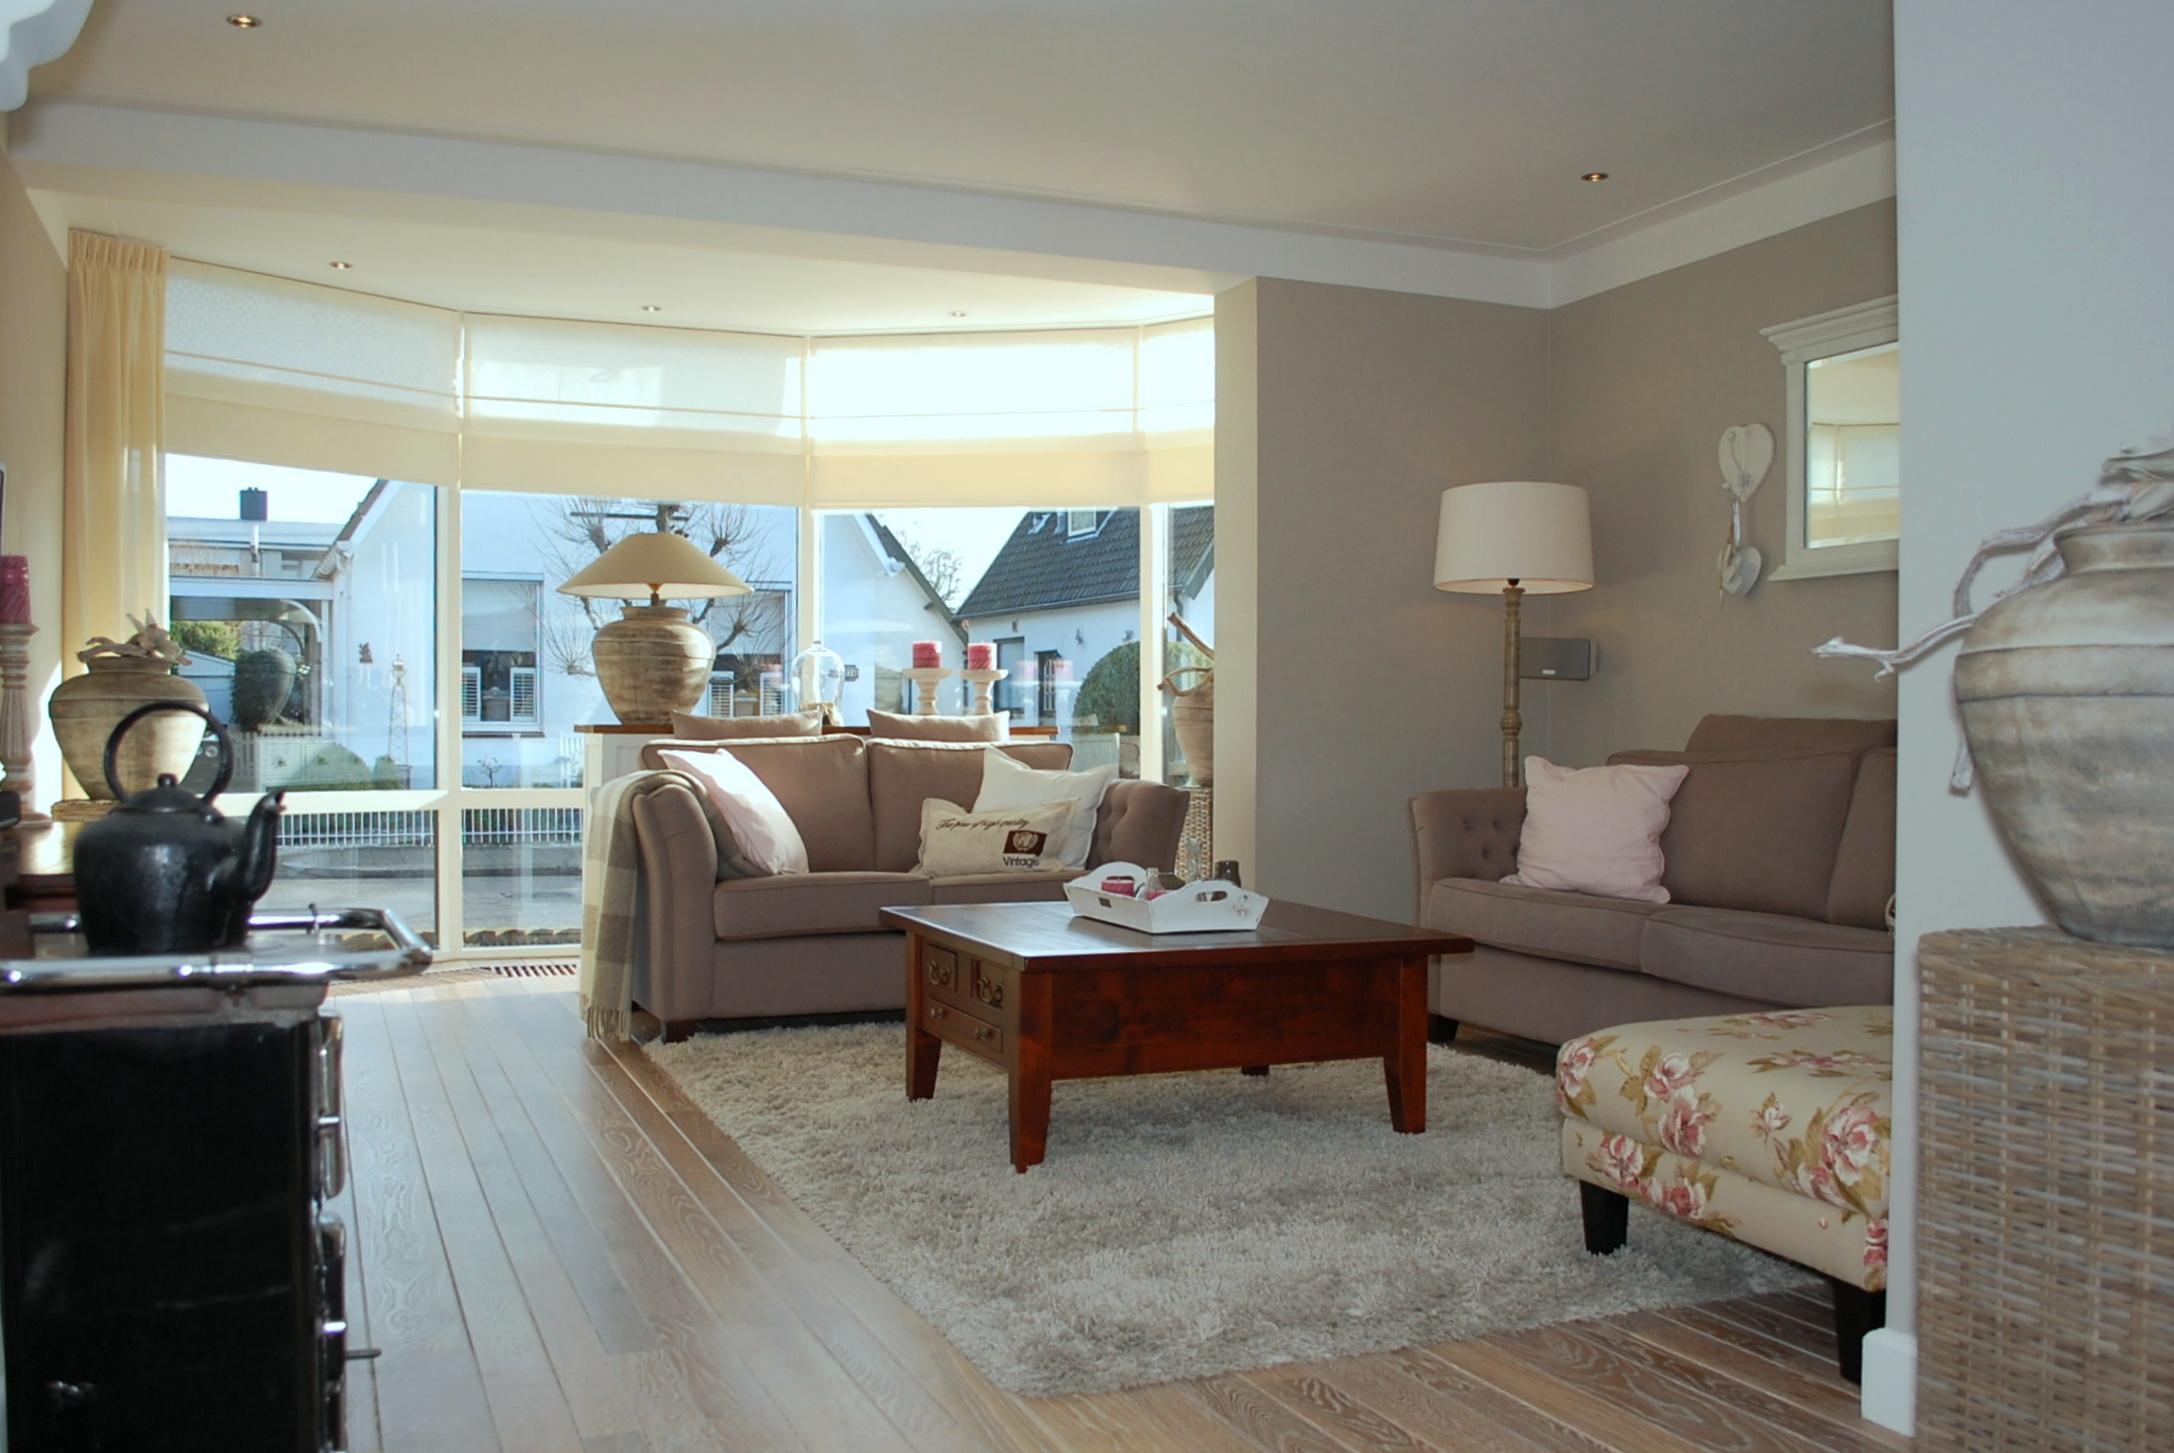 Interieur ideeen woonkamer kleur for Interieur kleur